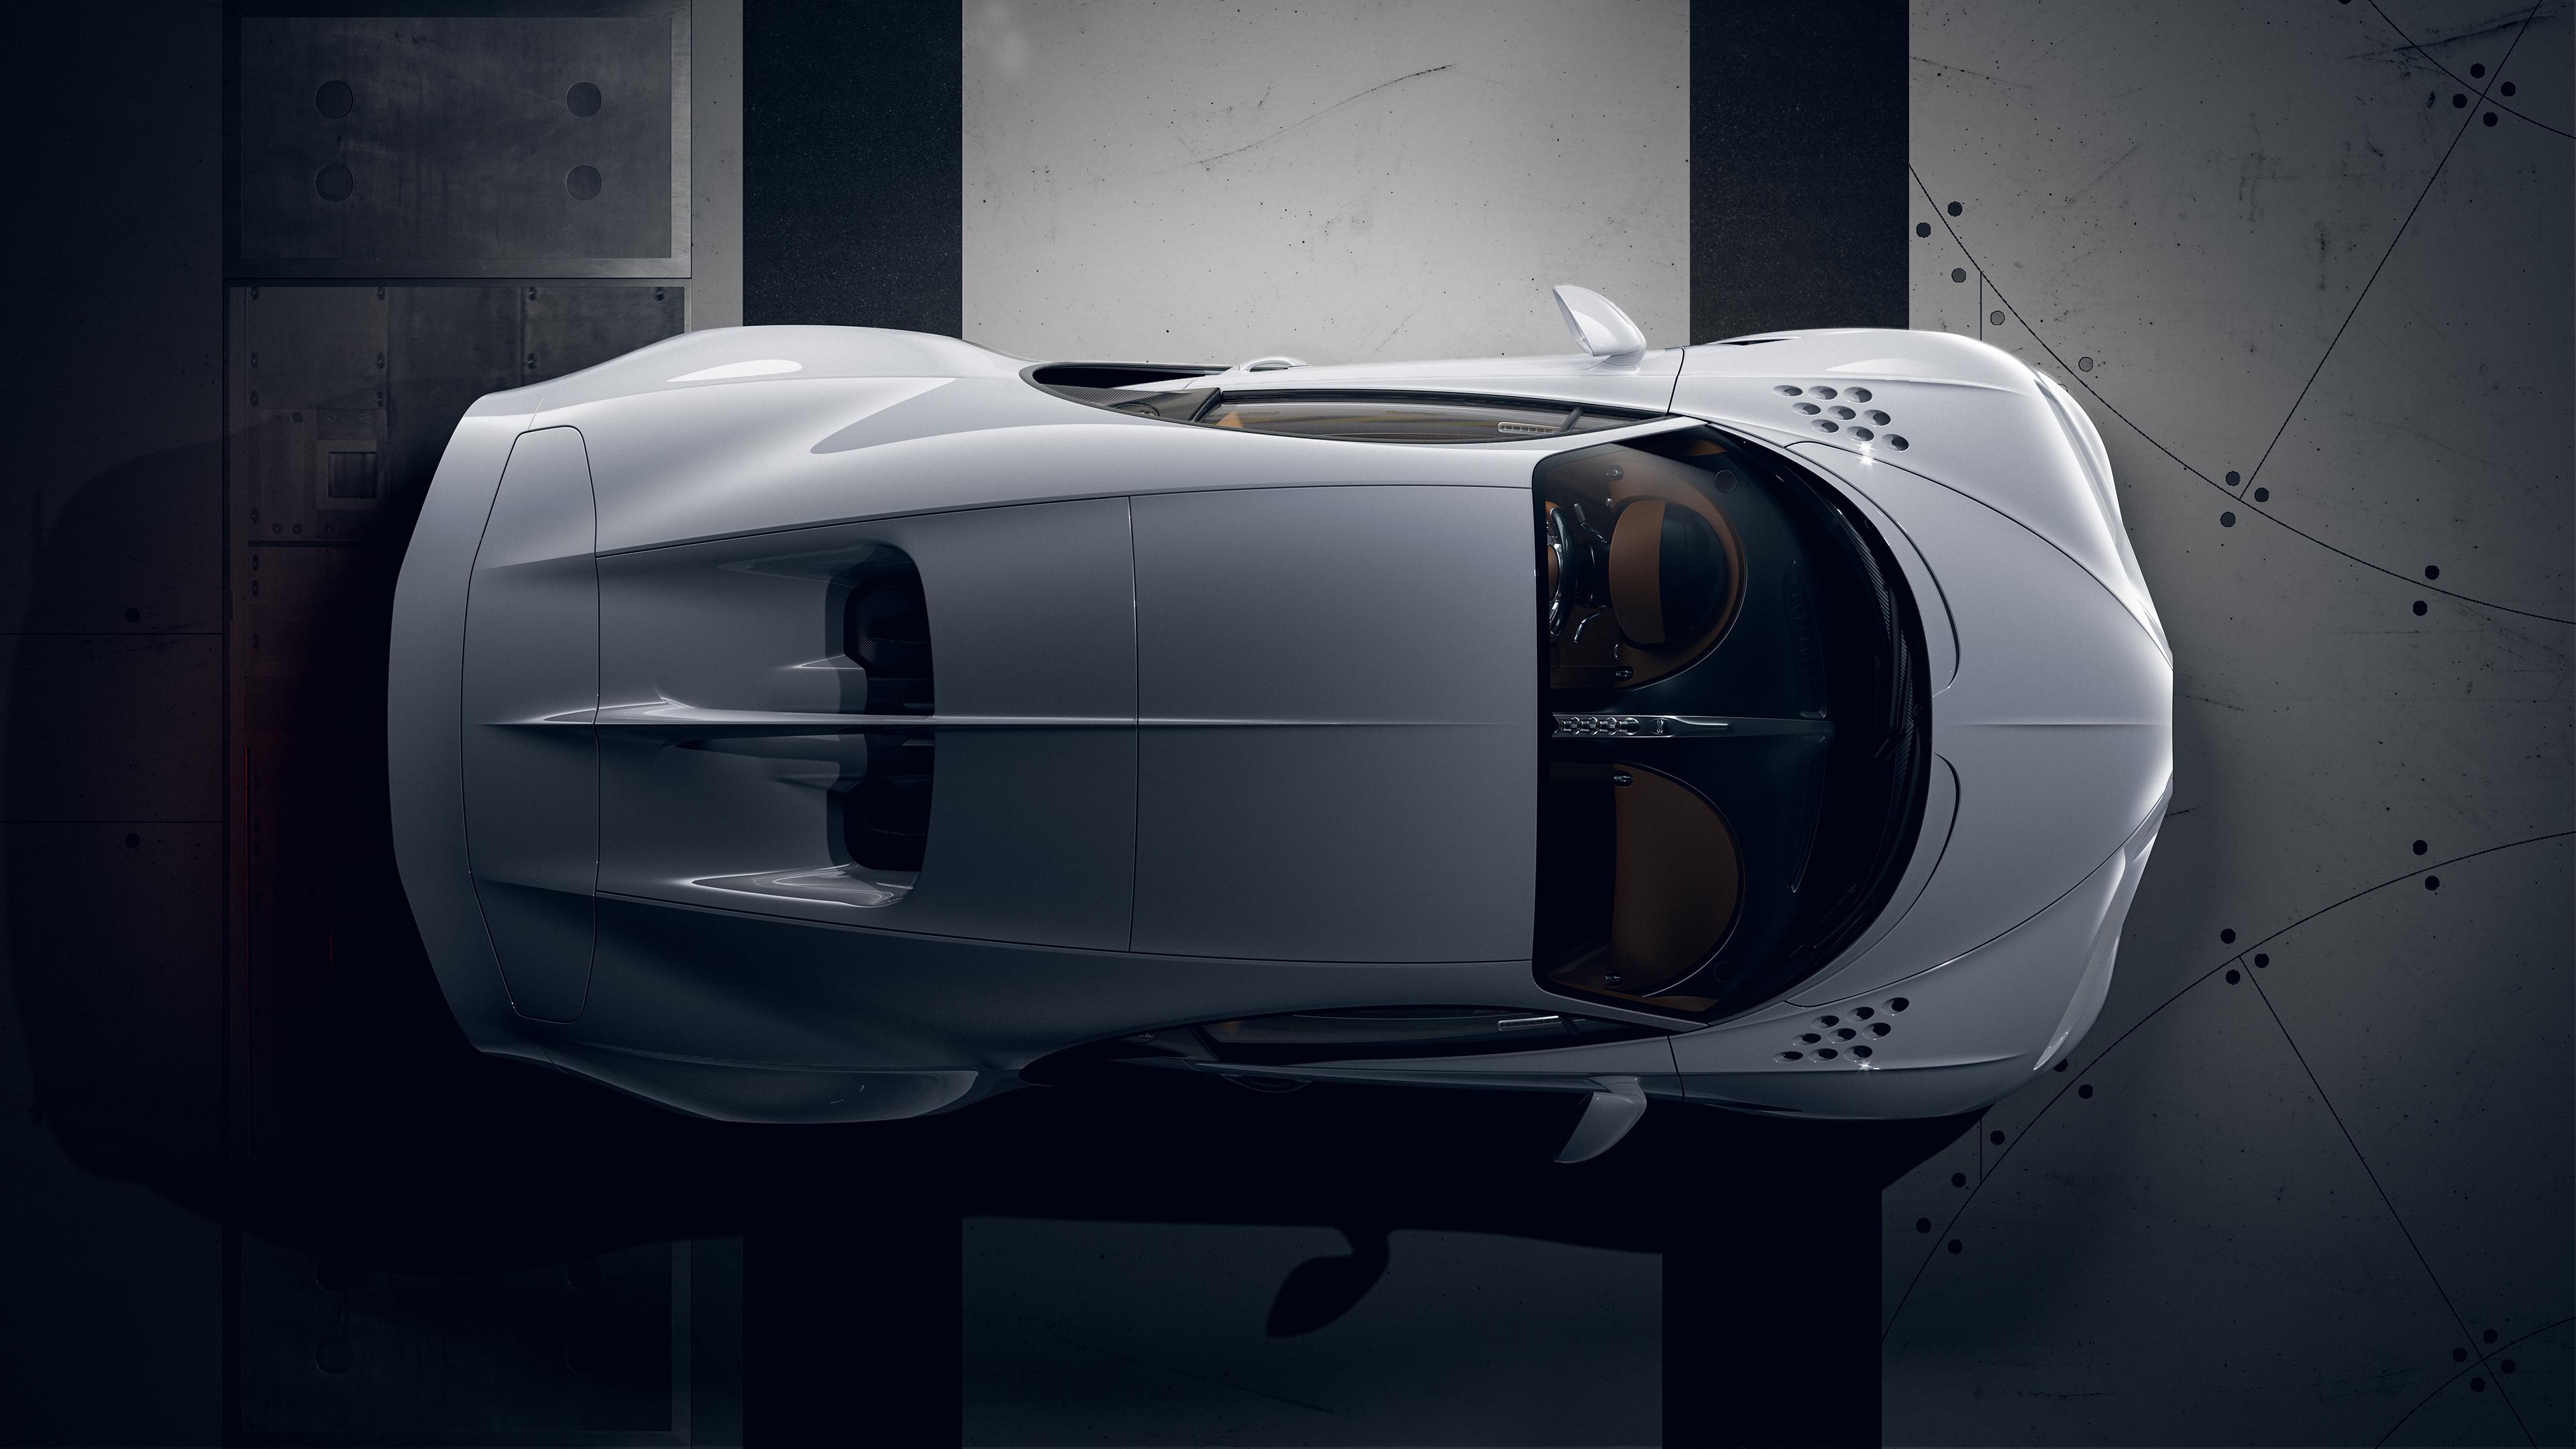 Bugatti Chiron Super Sport Top View Rendering